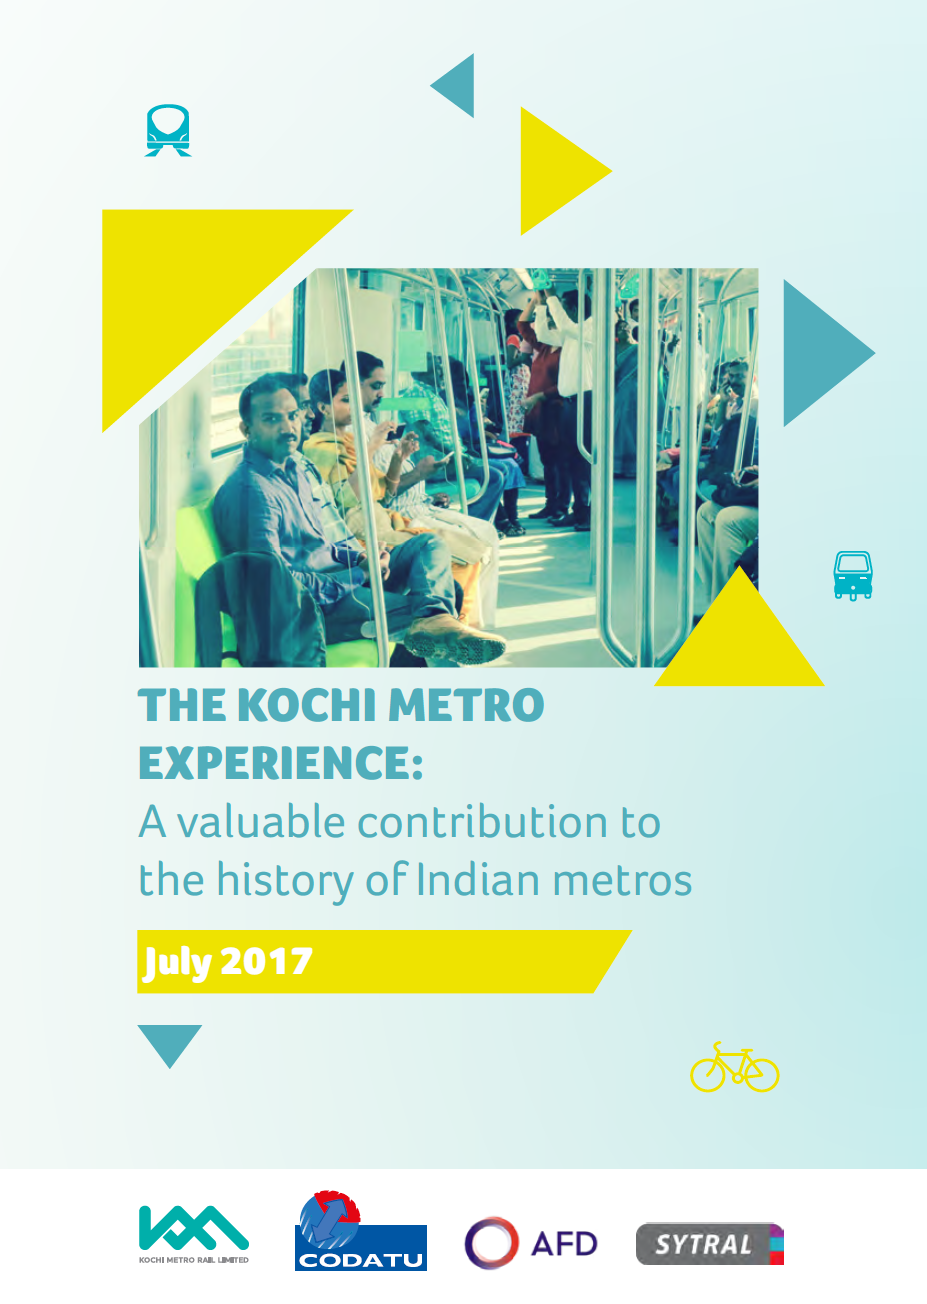 Kochi Metro Experience